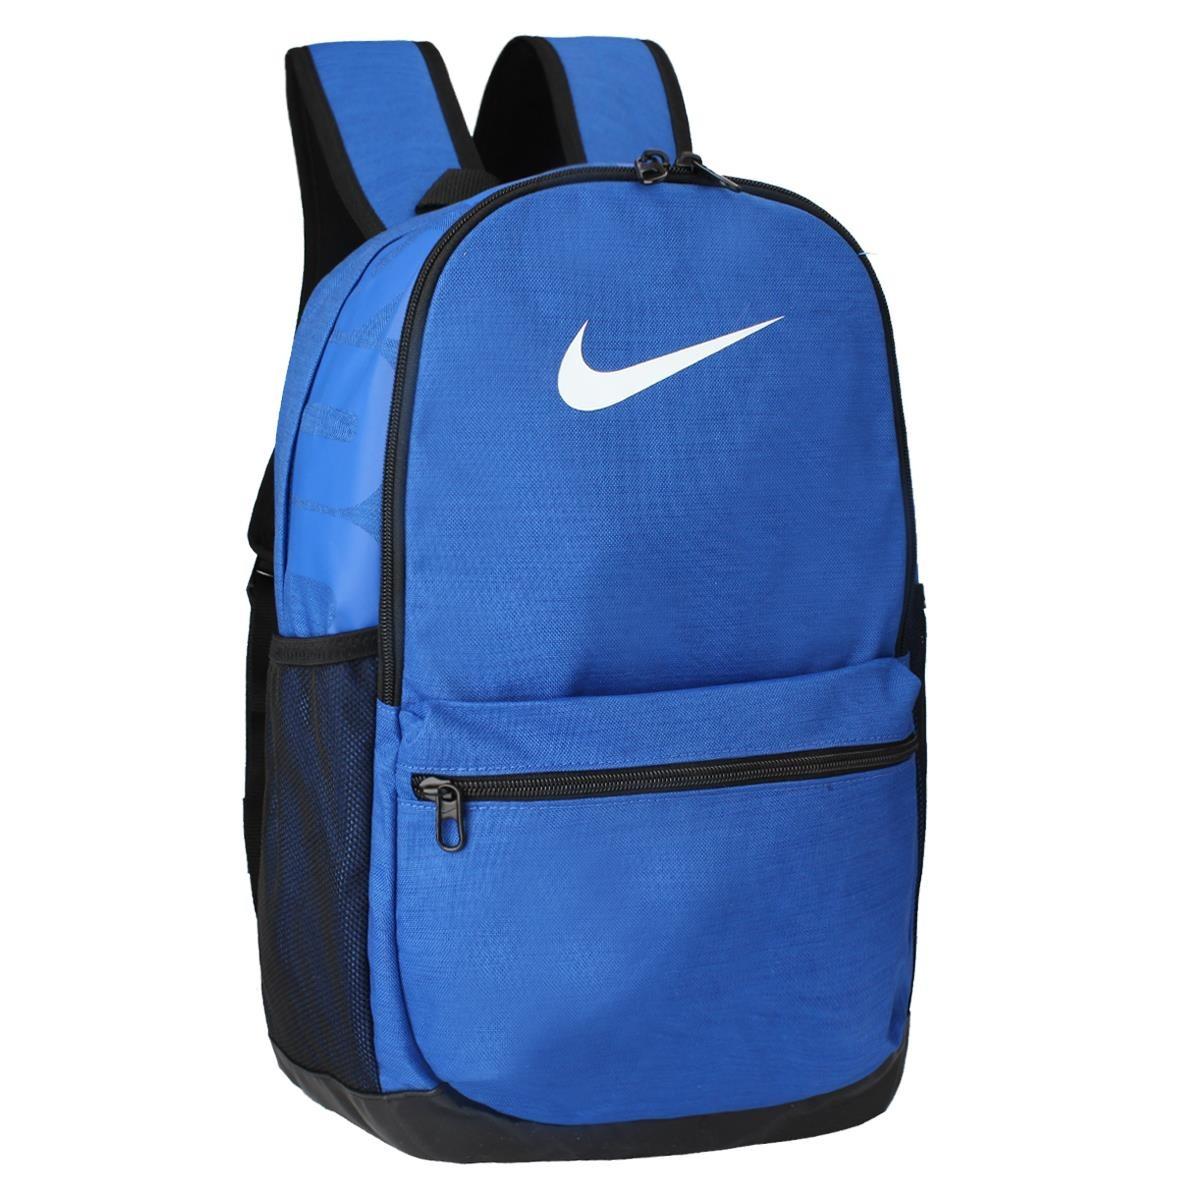 85bf0a51c6987 Mochila Brasilia Backpack - M